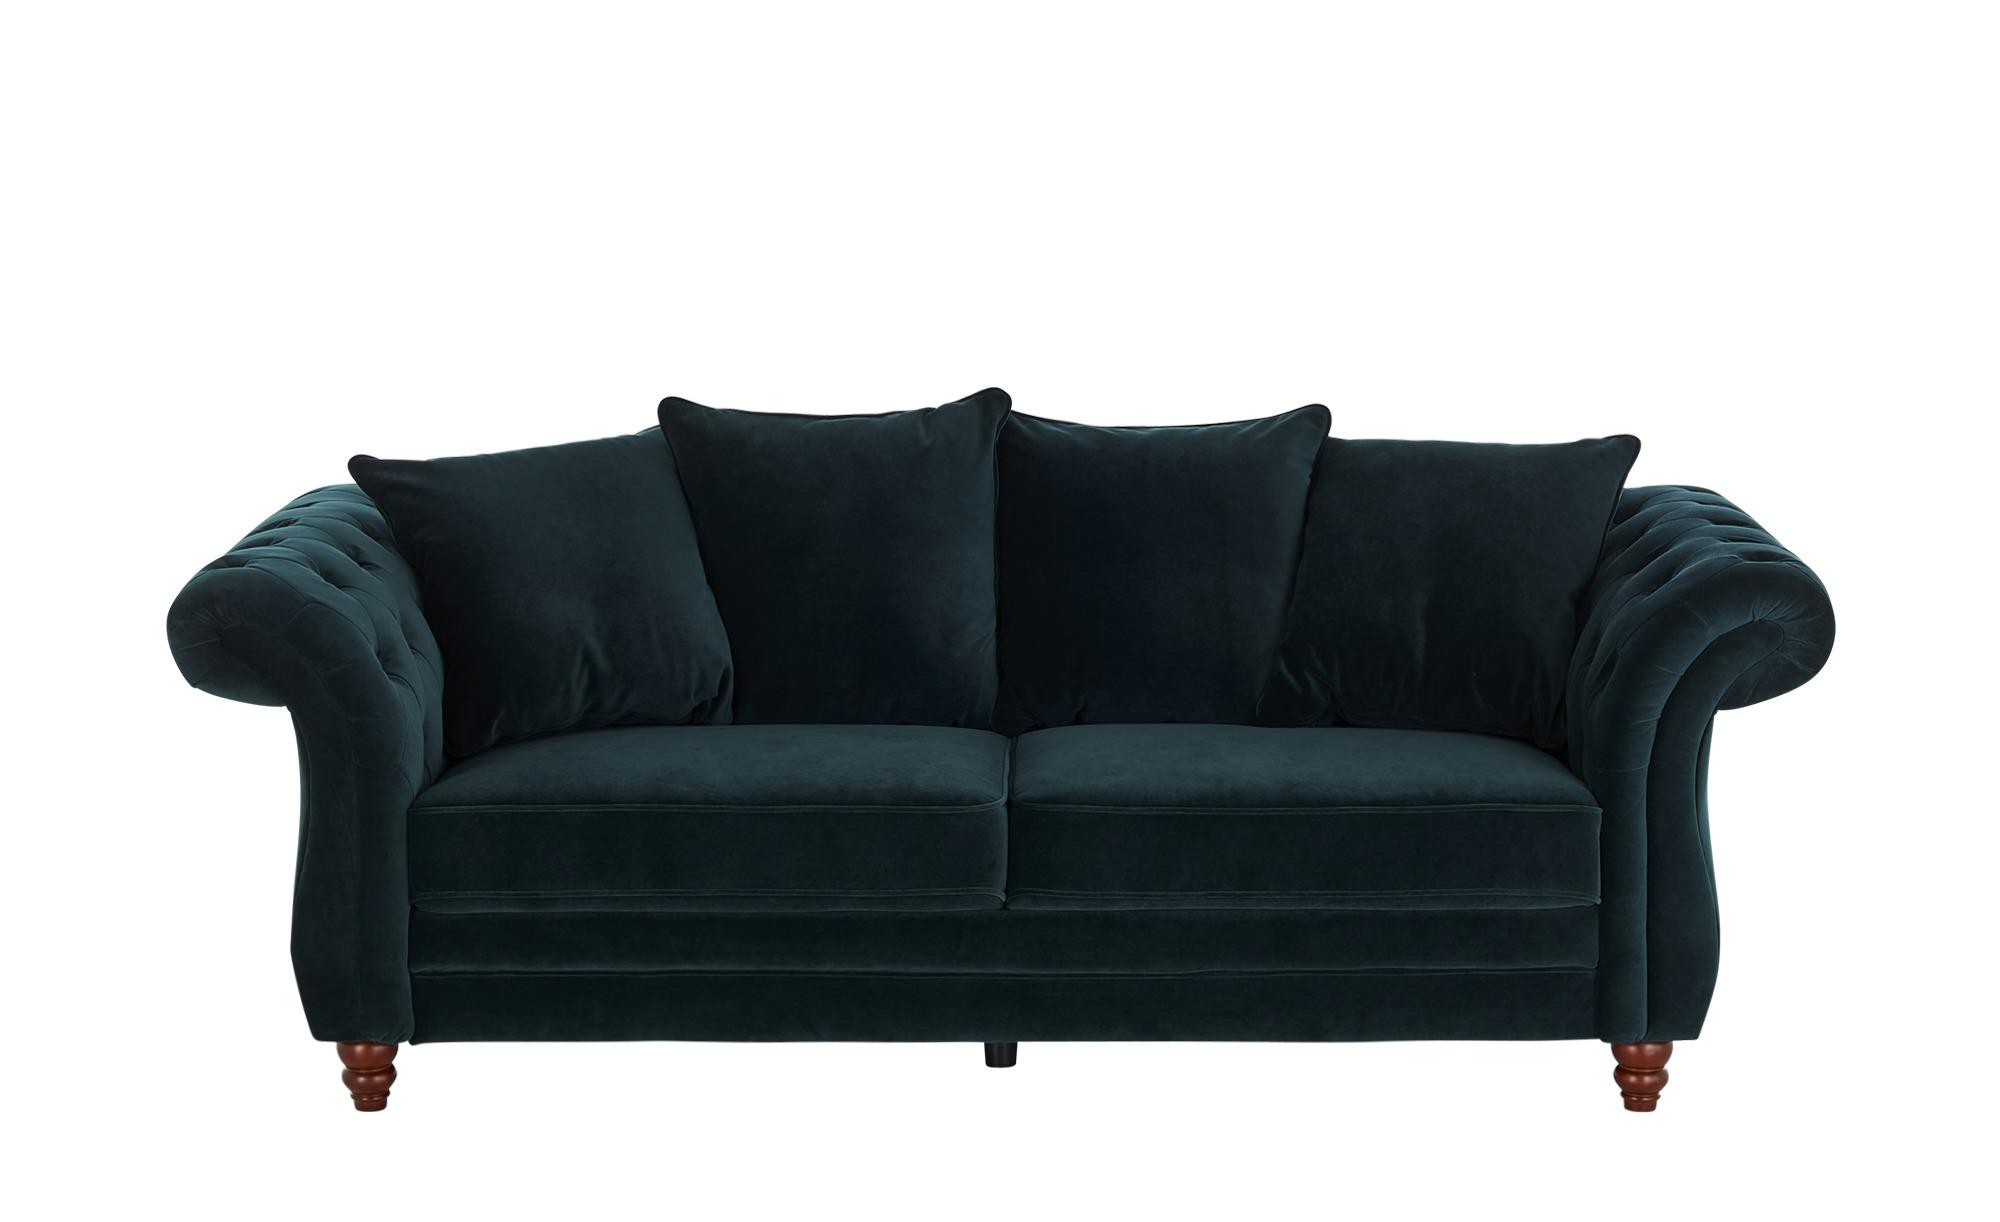 uno Sofa 3-sitzig  Chesterfield Sofa Luna ¦ grün ¦ Maße (cm): B: 226 H: 88 T: 95 Polstermöbel > Sofas > 3-Sitzer - Höffner